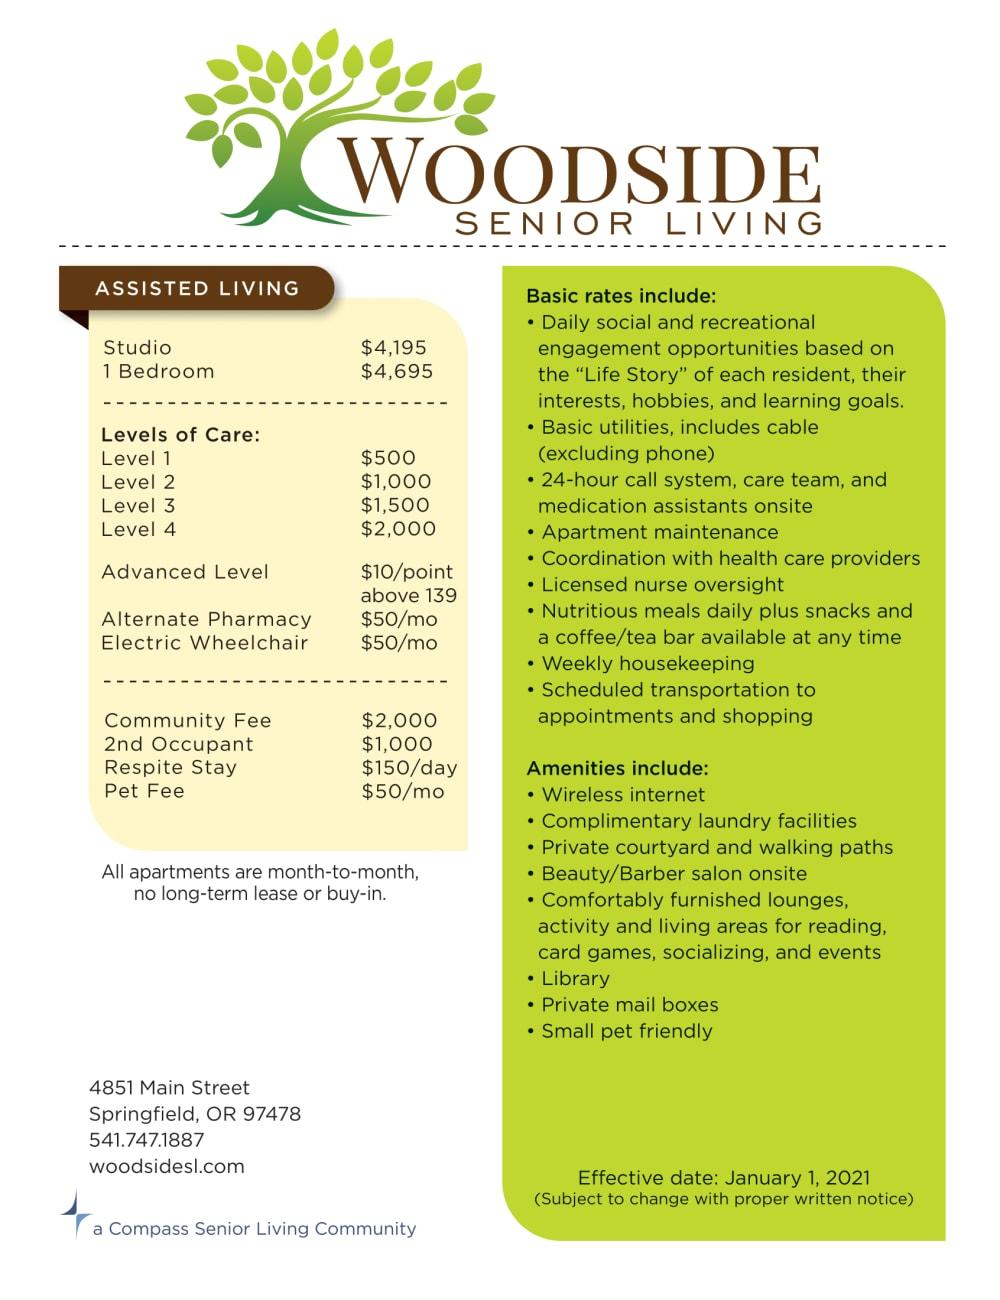 Woodside Senior Living rates